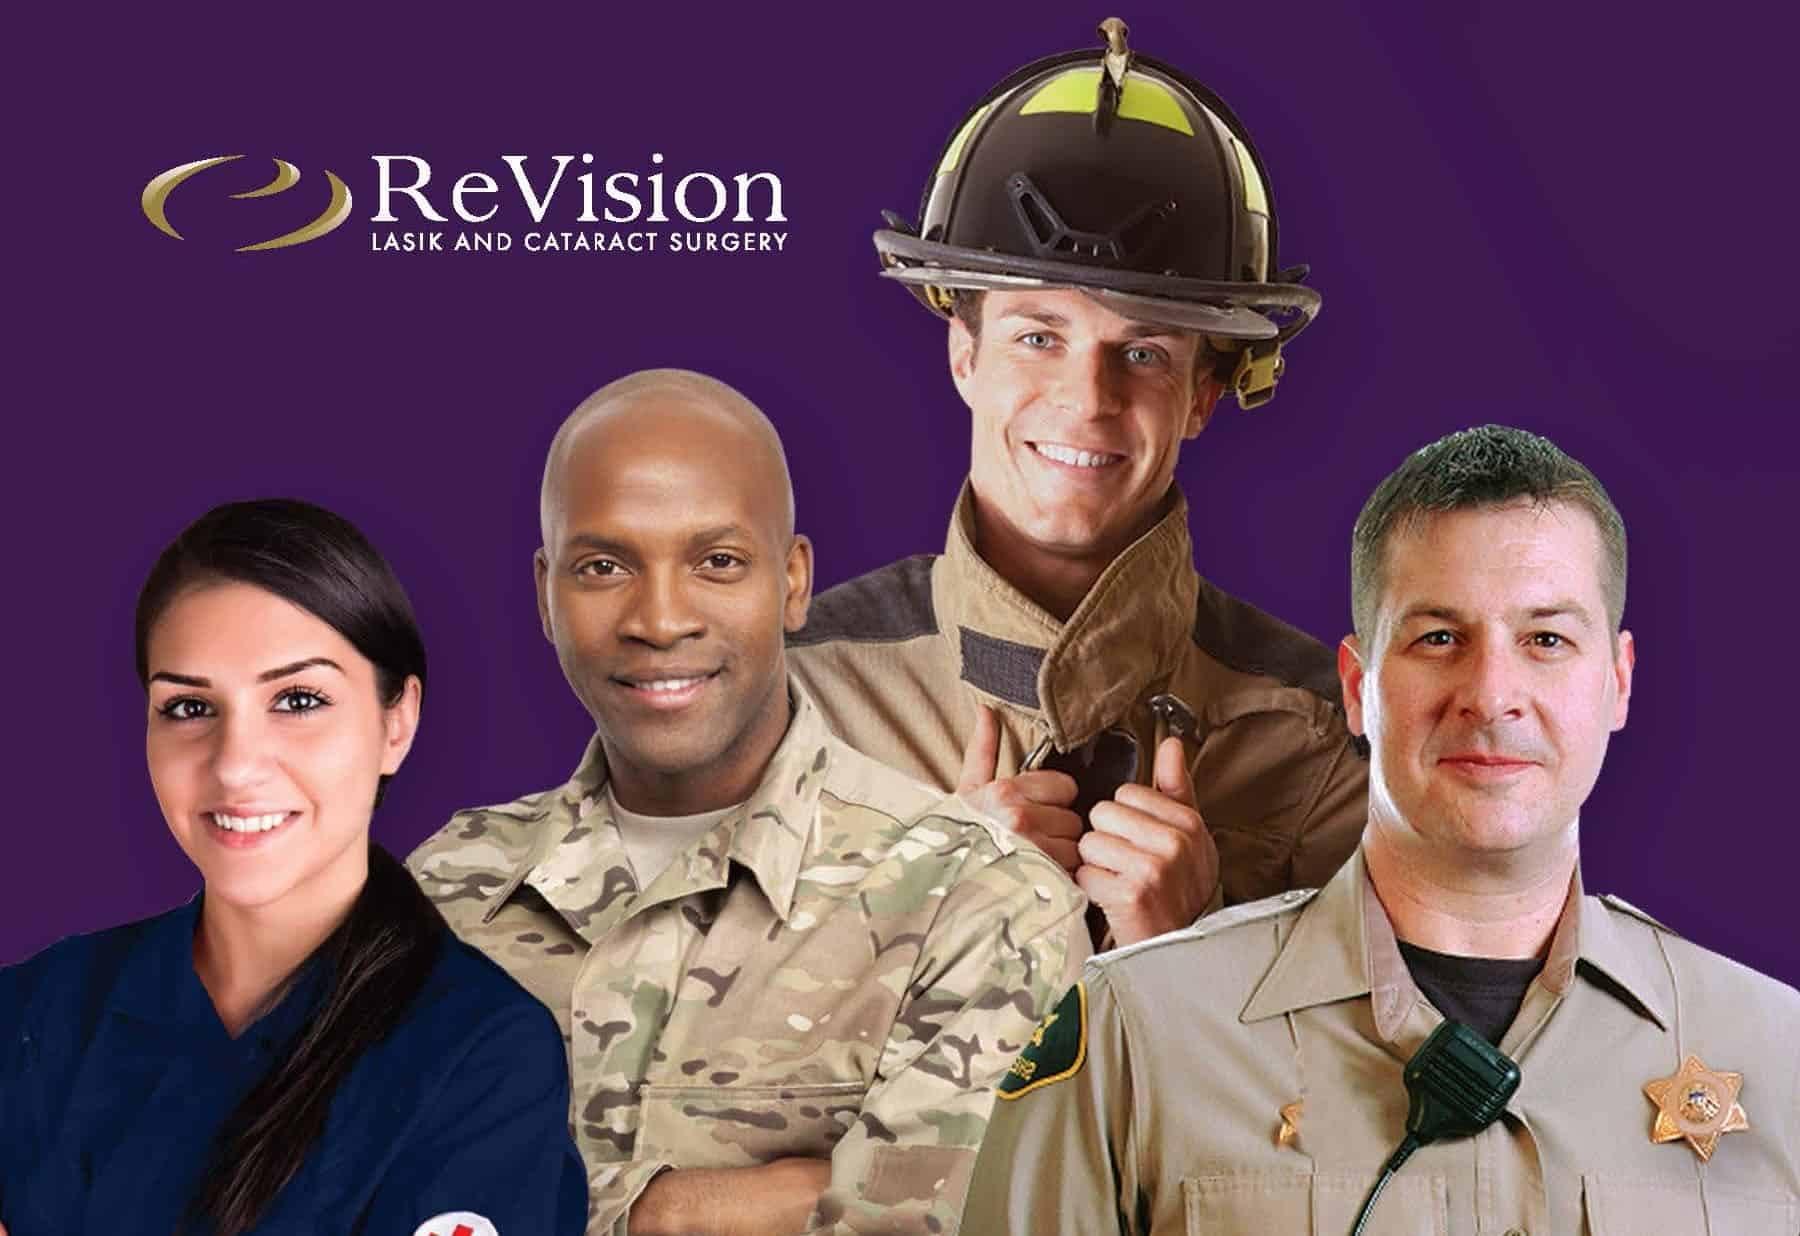 ReVision Gives Back